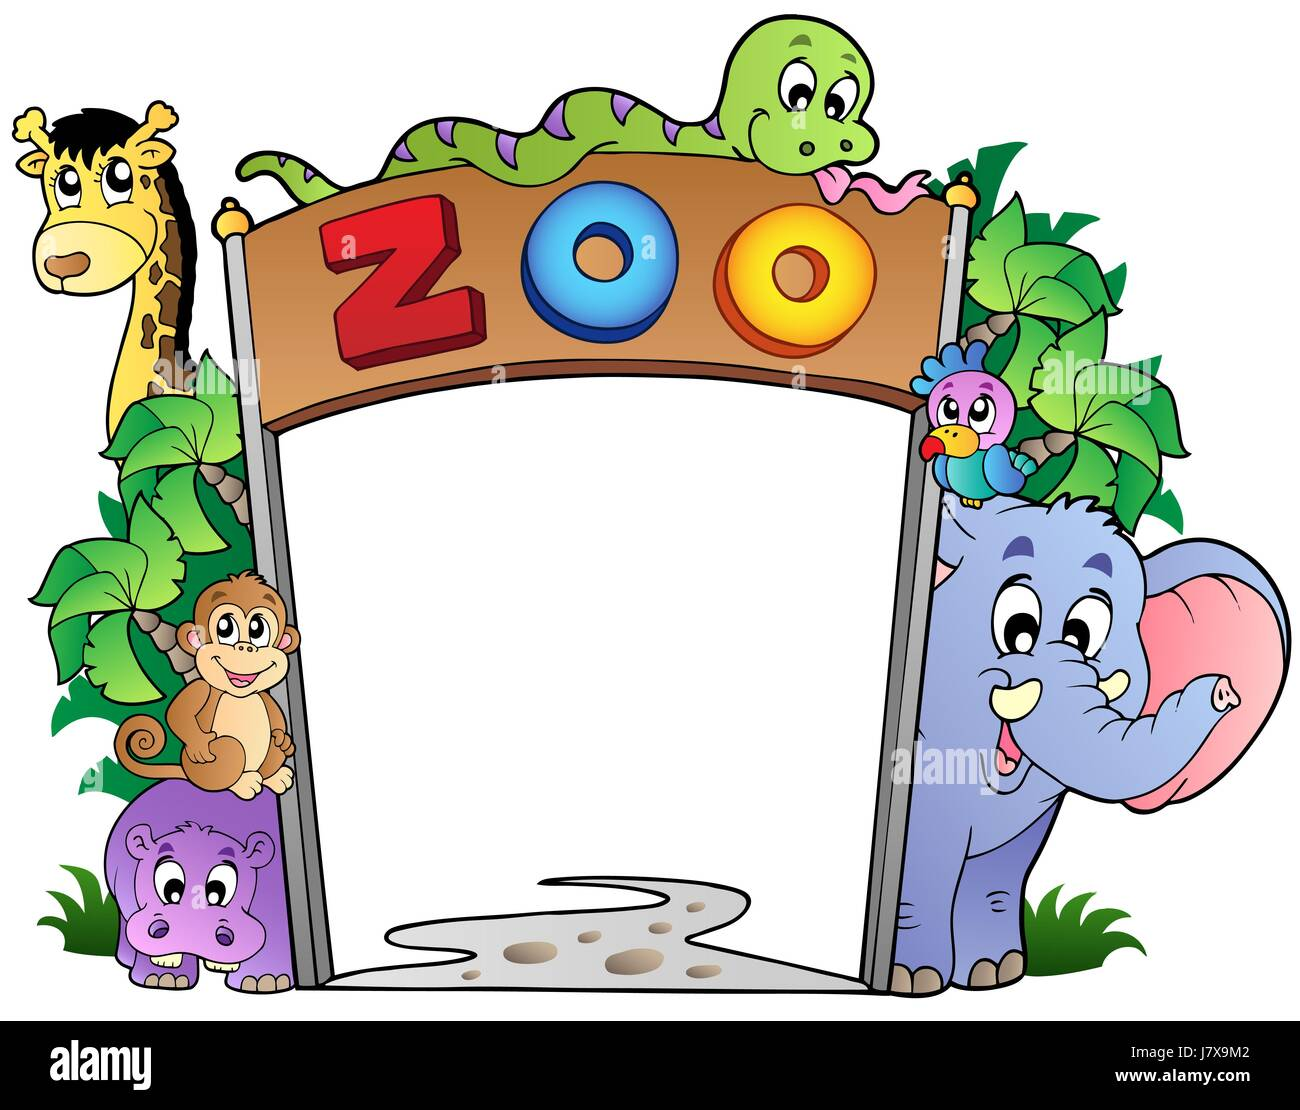 Foyer Entry Zoo : Garden entrance zoo enter entry zoological way board leaf